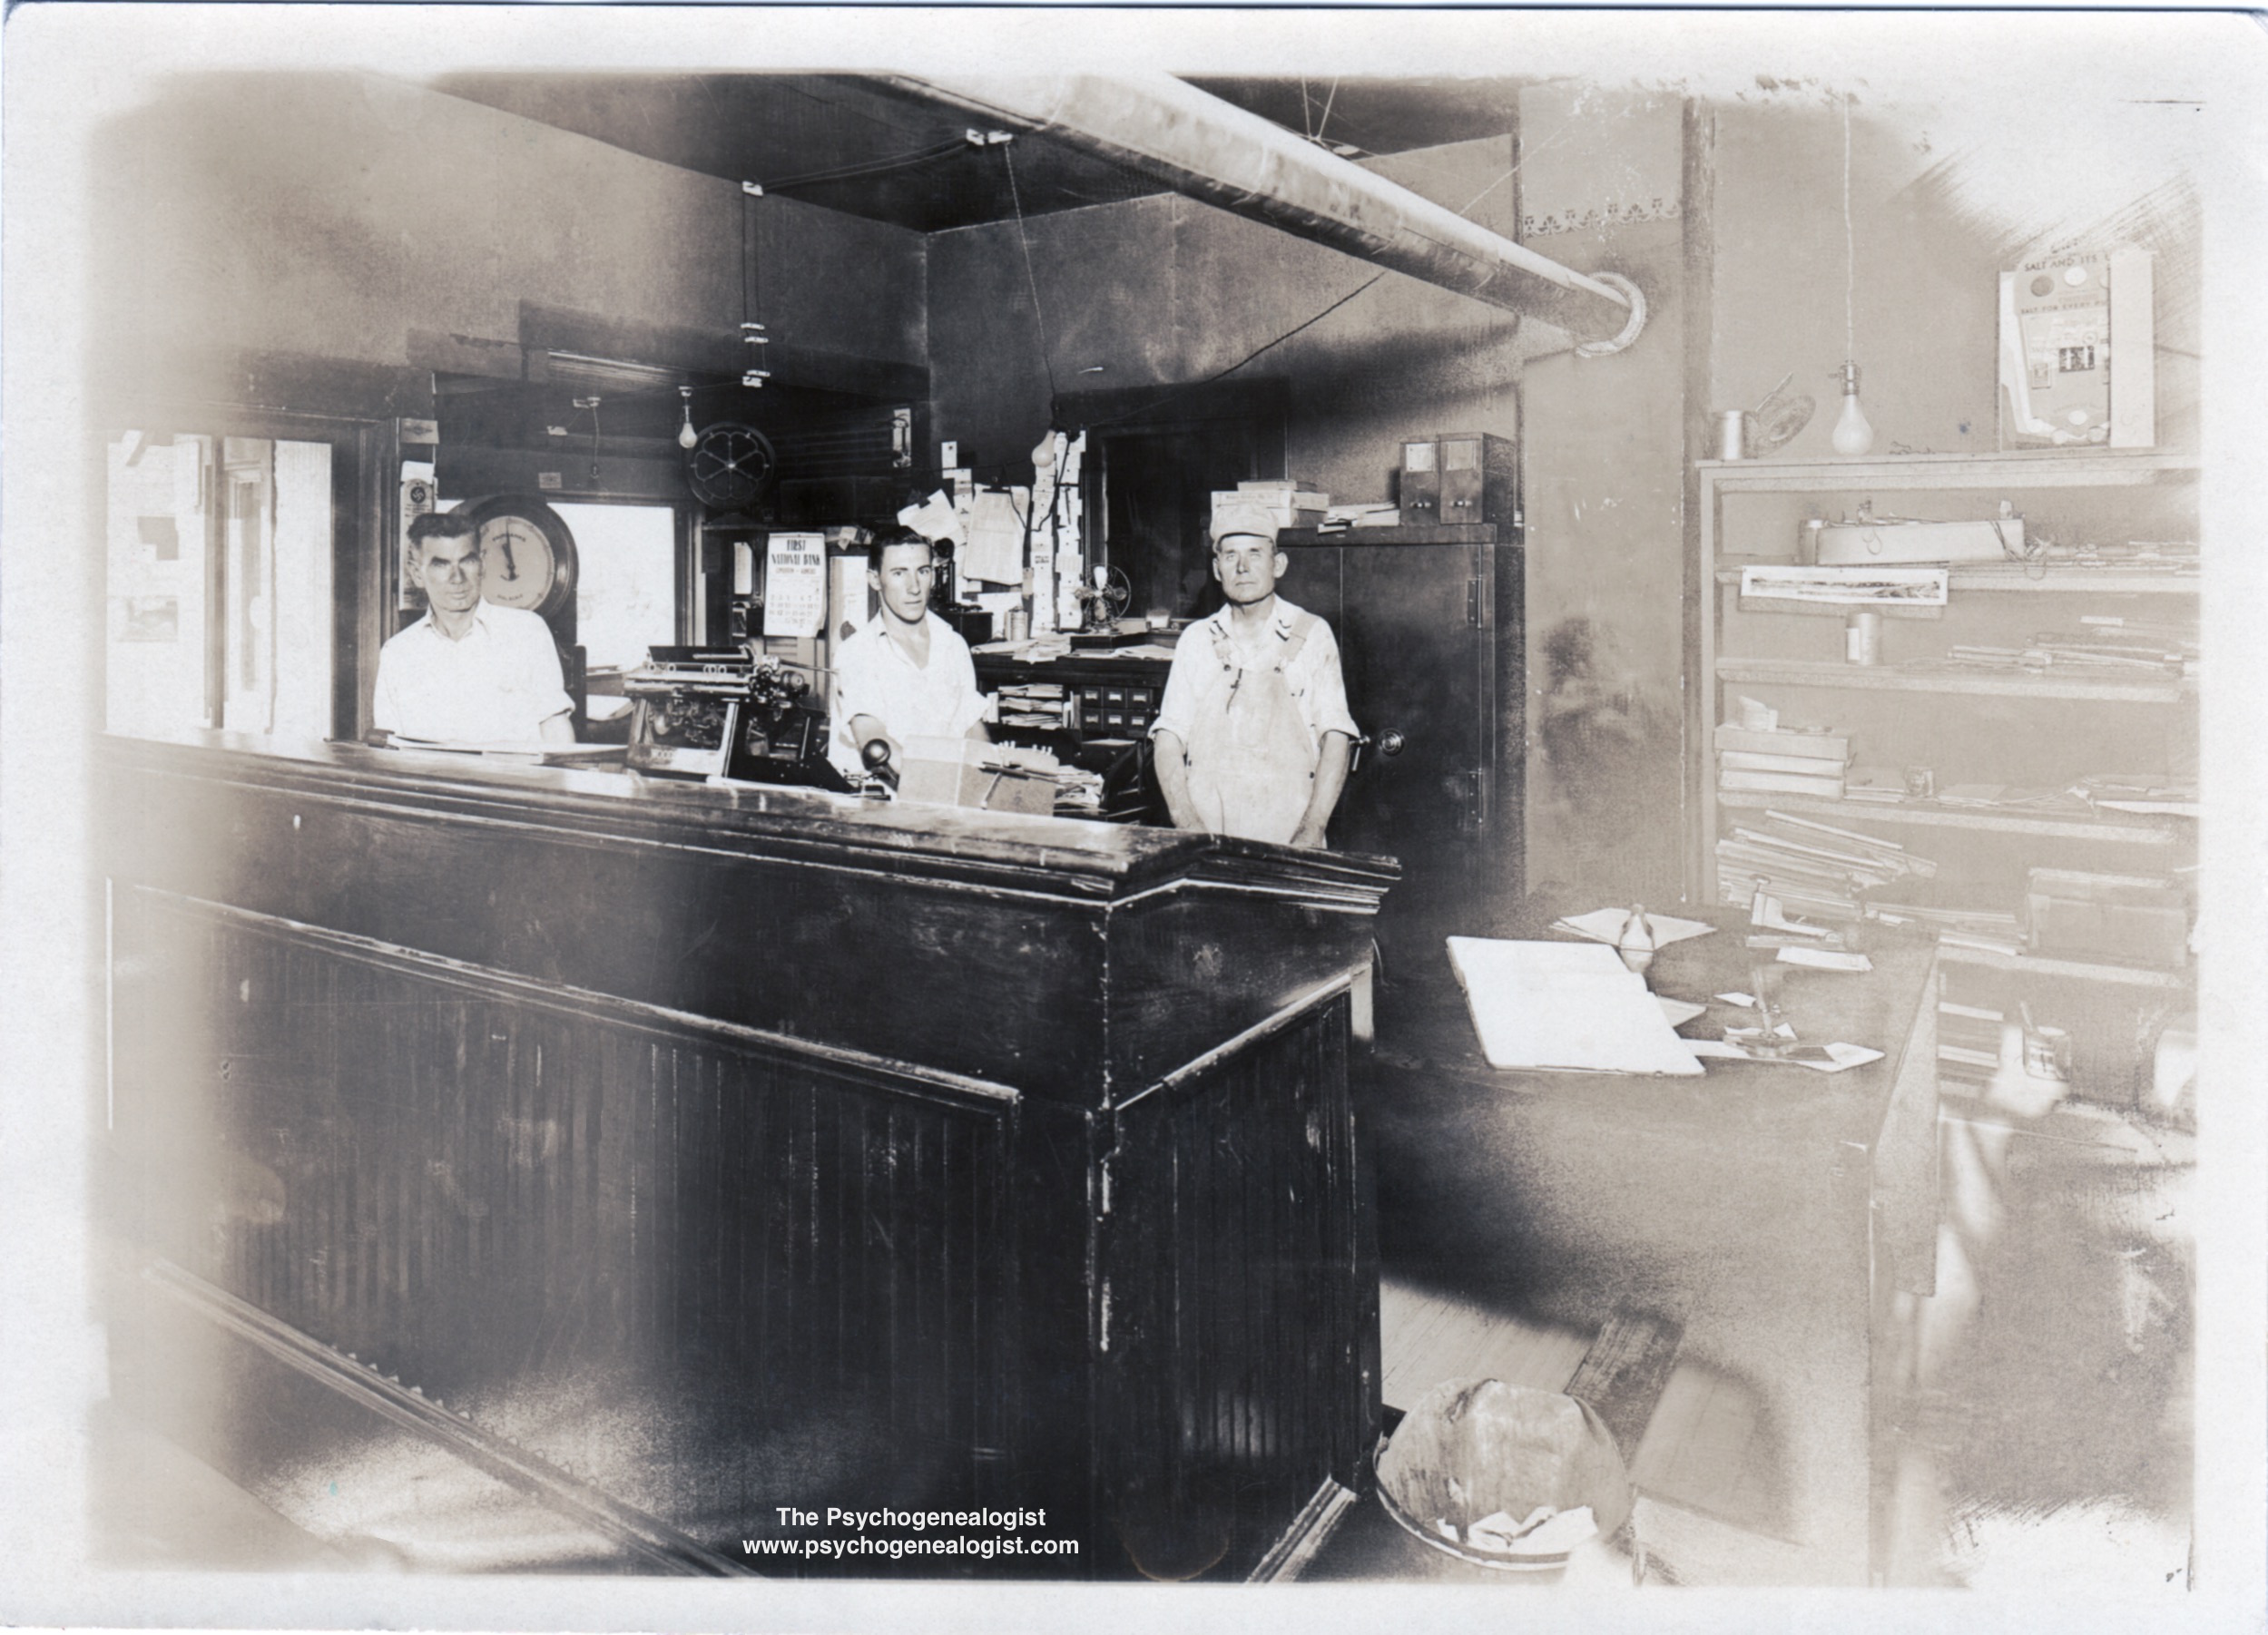 Workers Industrial Shop Workshop Office 1920s